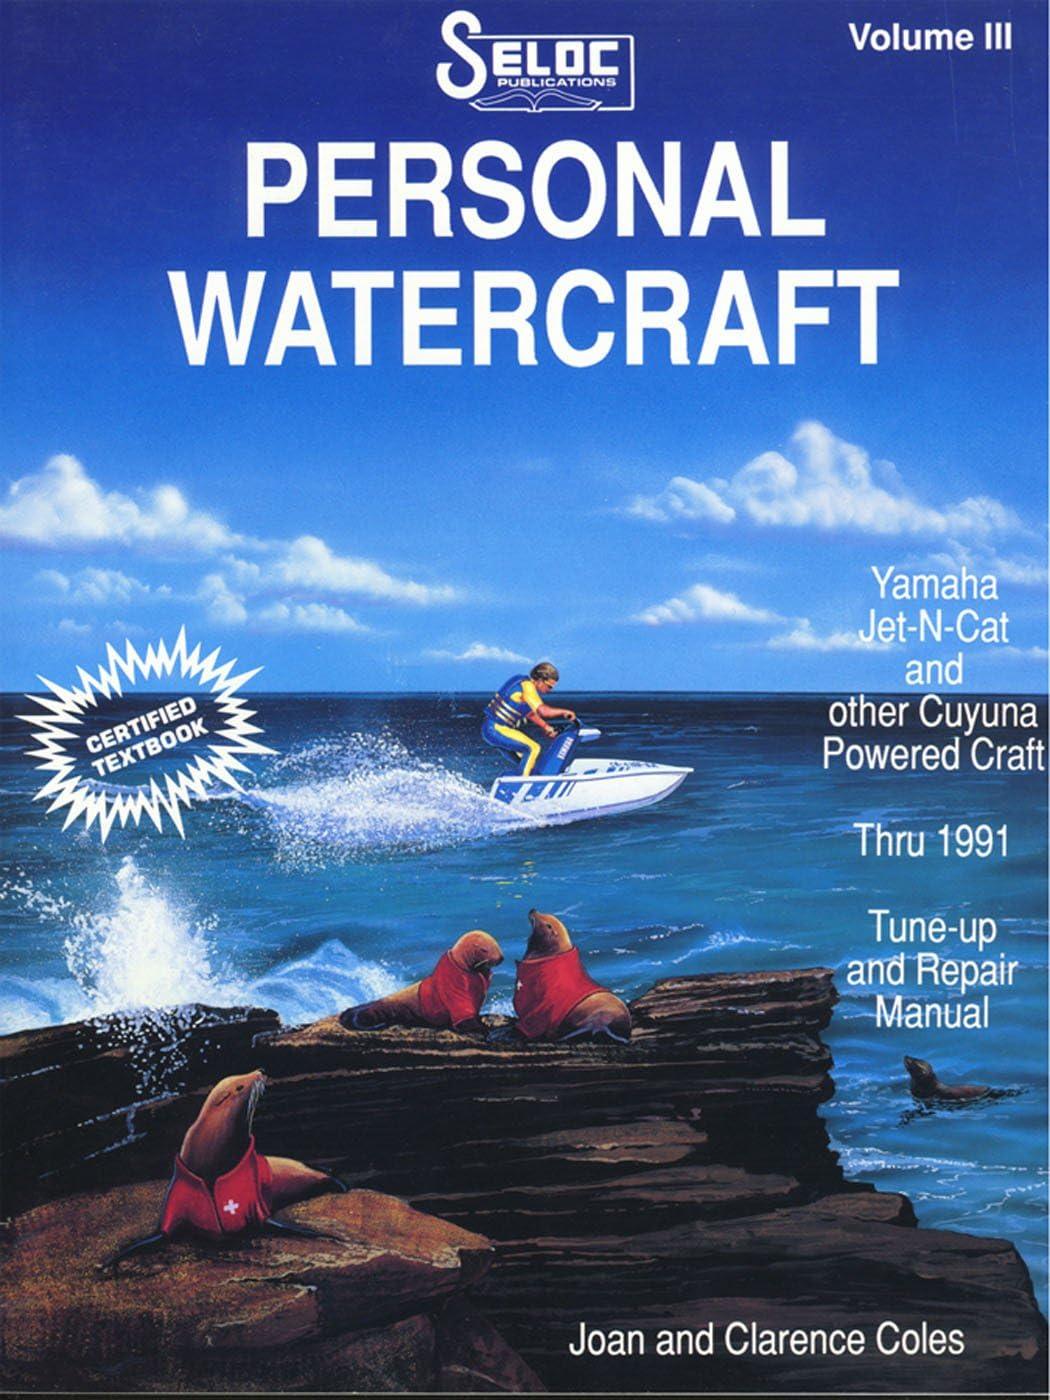 Sierra International Denver Mall Seloc Manual 18-09600 Yamaha Water Japan's largest assortment Personal